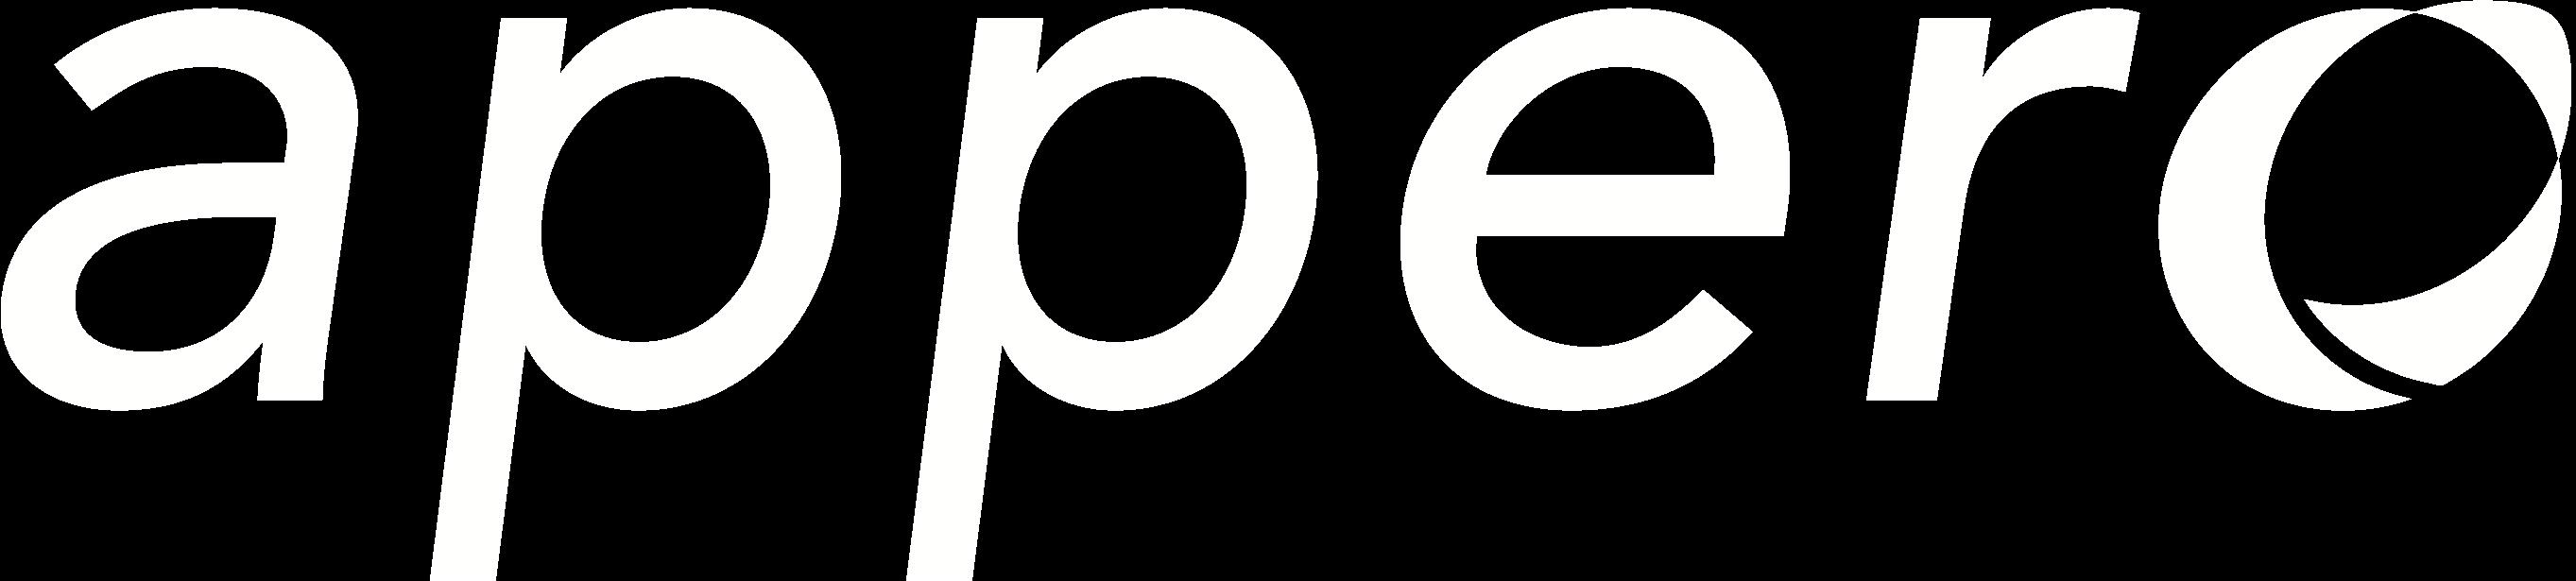 appero_Logo_transparent.png